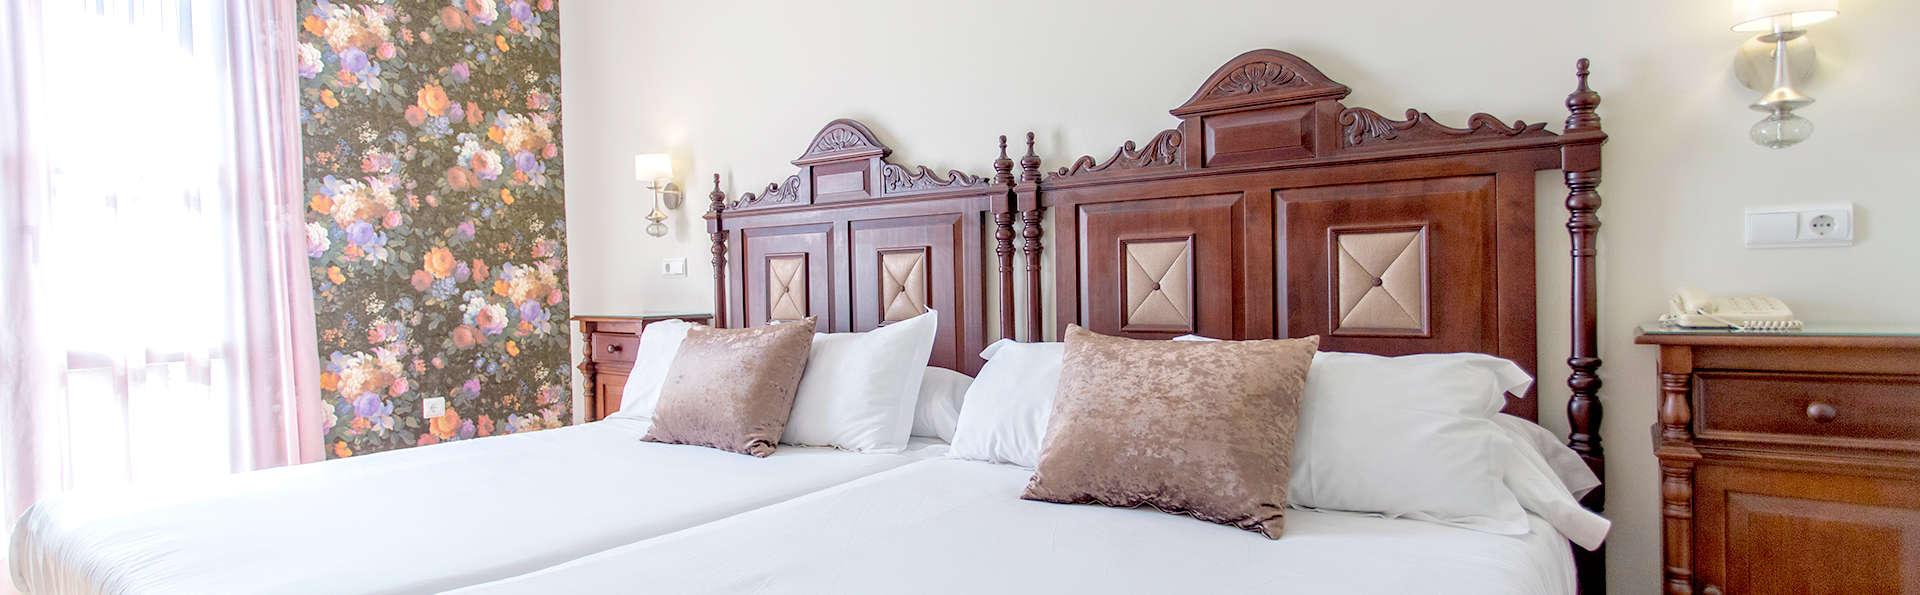 Hotel Rosaleda de Don Pedro - Edit_Room8.jpg